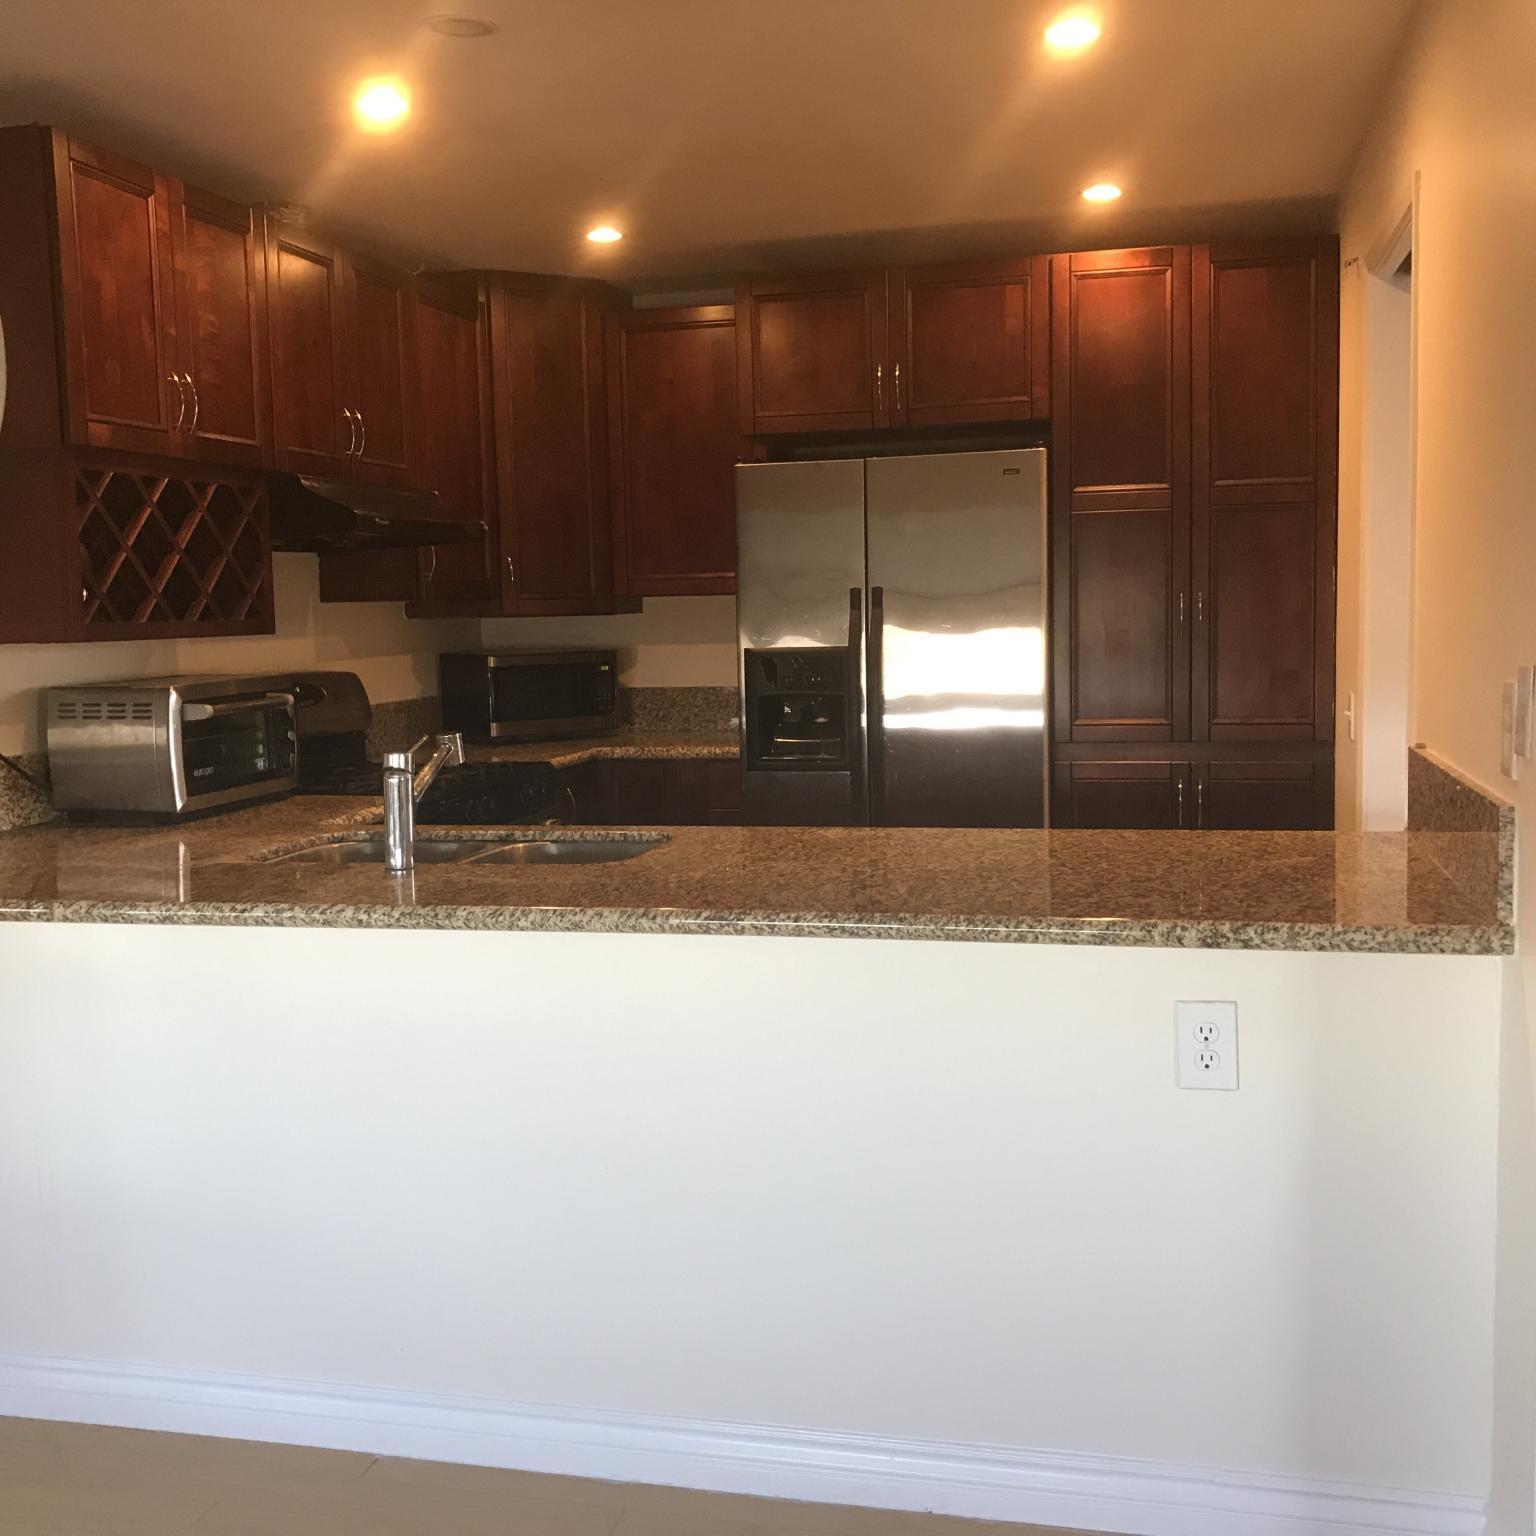 4832 W 5th St #A, Santa Ana, CA 92703 For Rent | Trulia